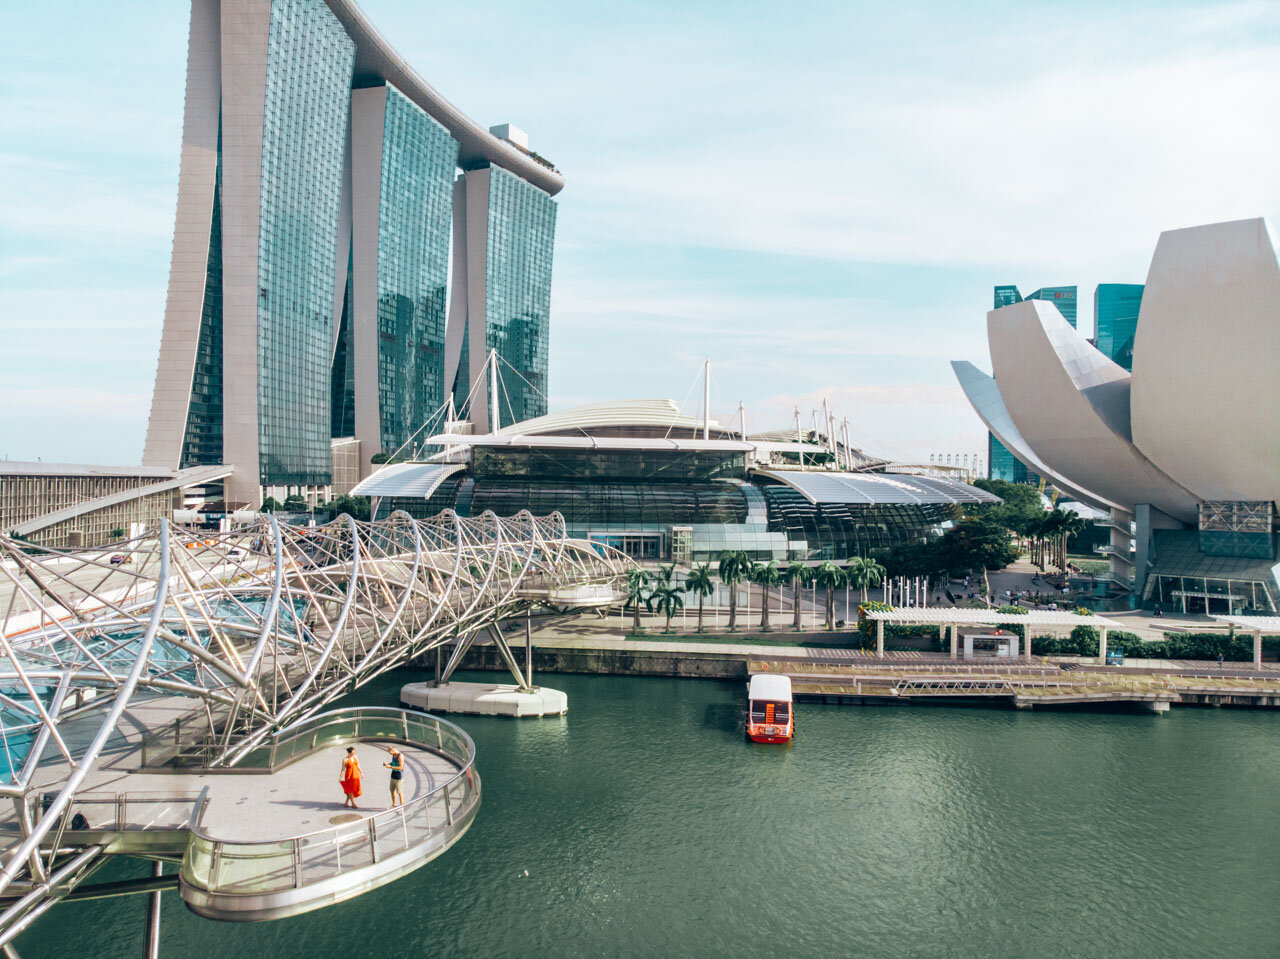 Helix Bridge Marina Bay Singapore 3 day itinerary